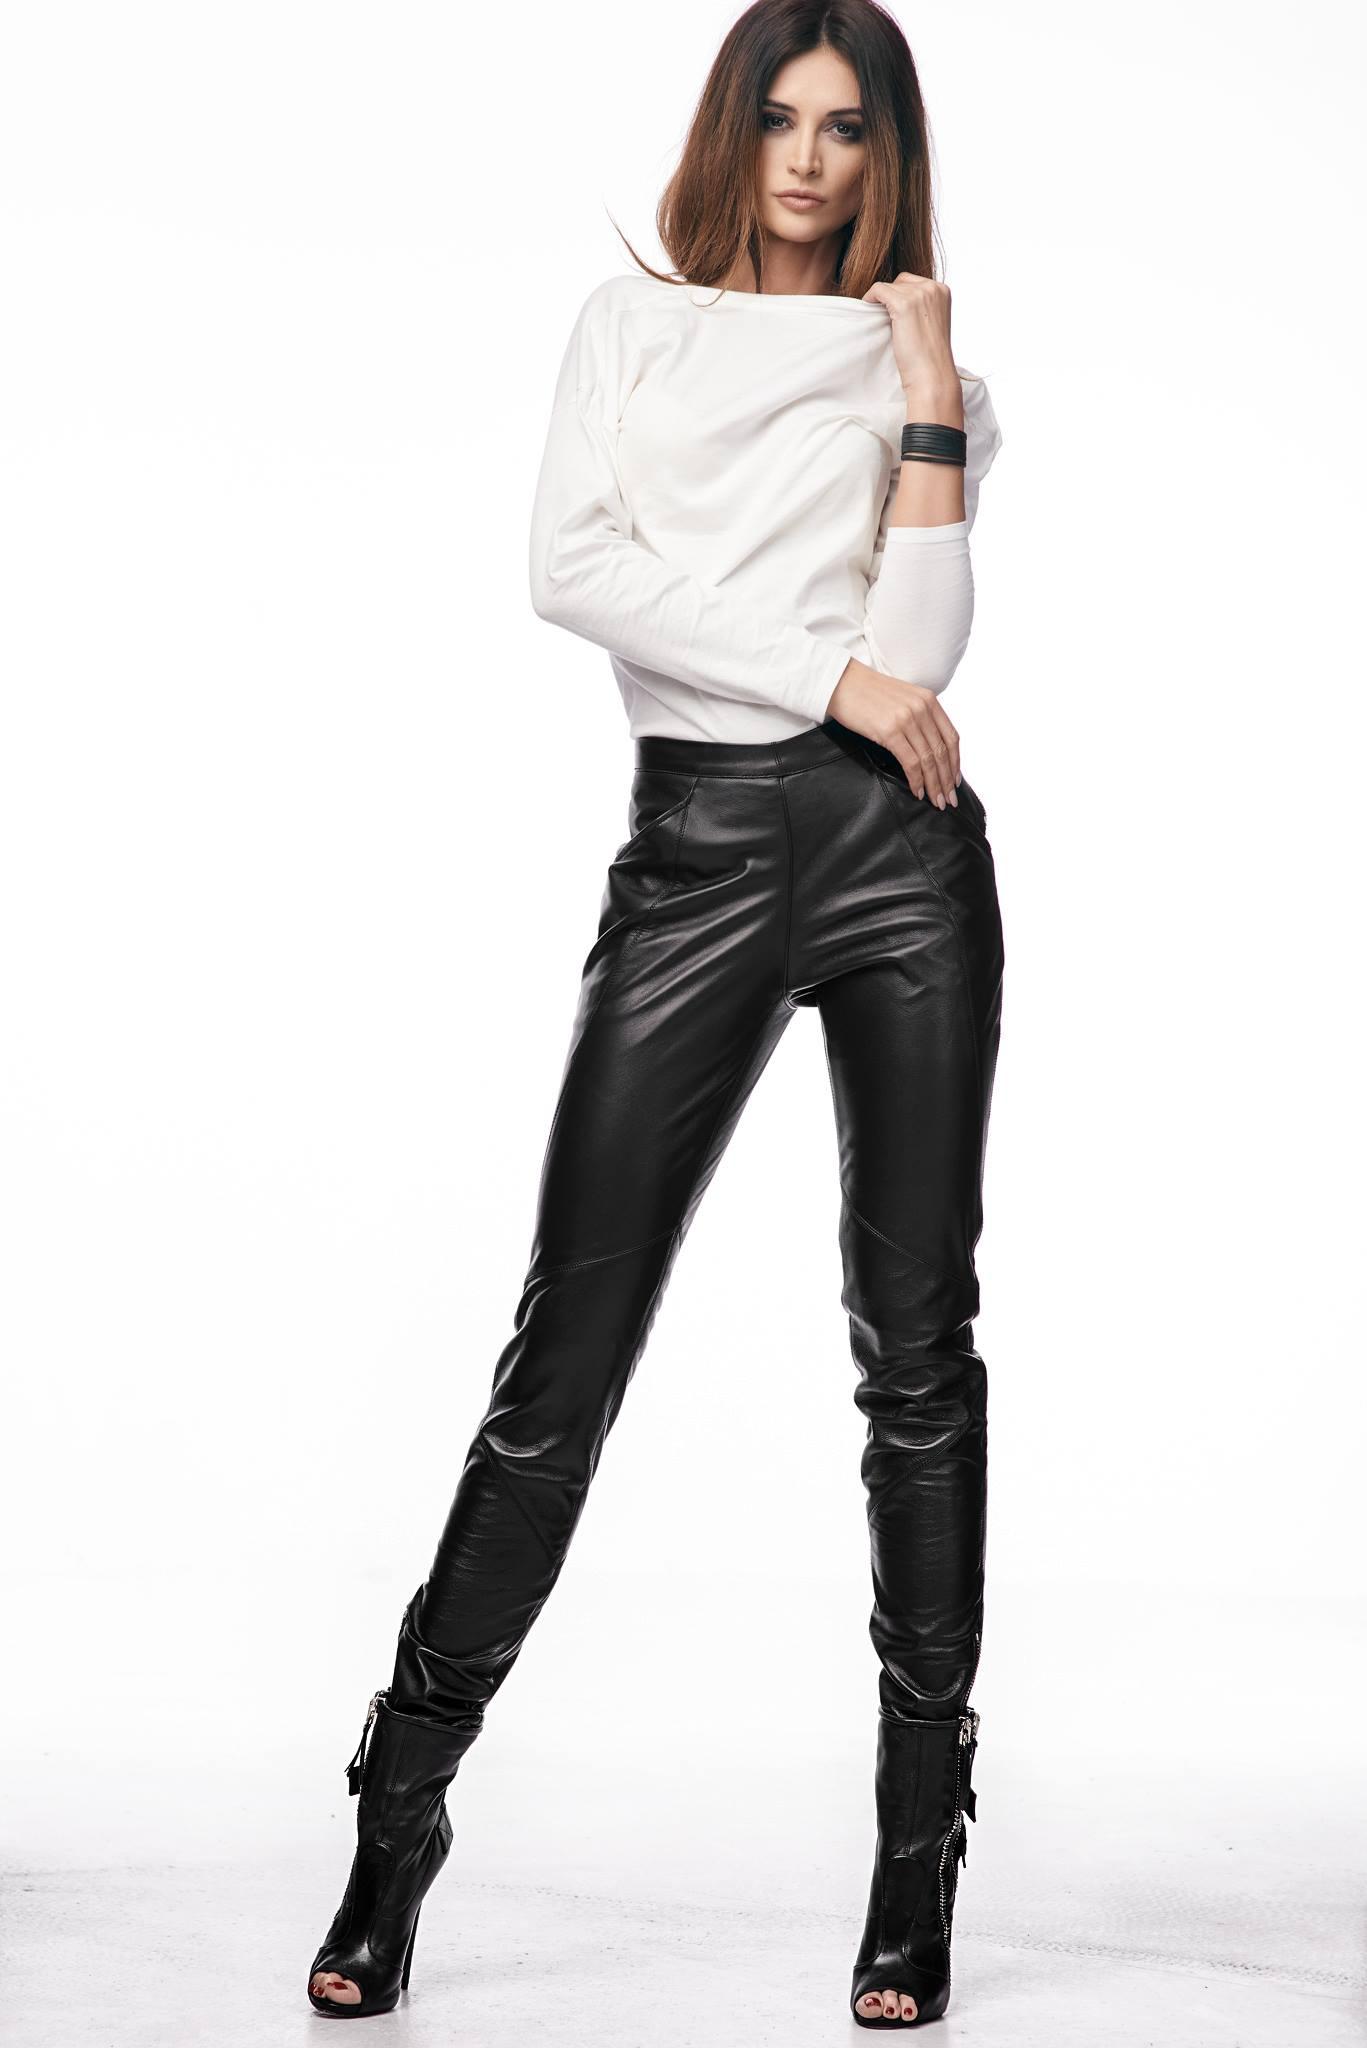 Wioleta Budnik-Juhlke photoshoot for Mojry Natural Leather